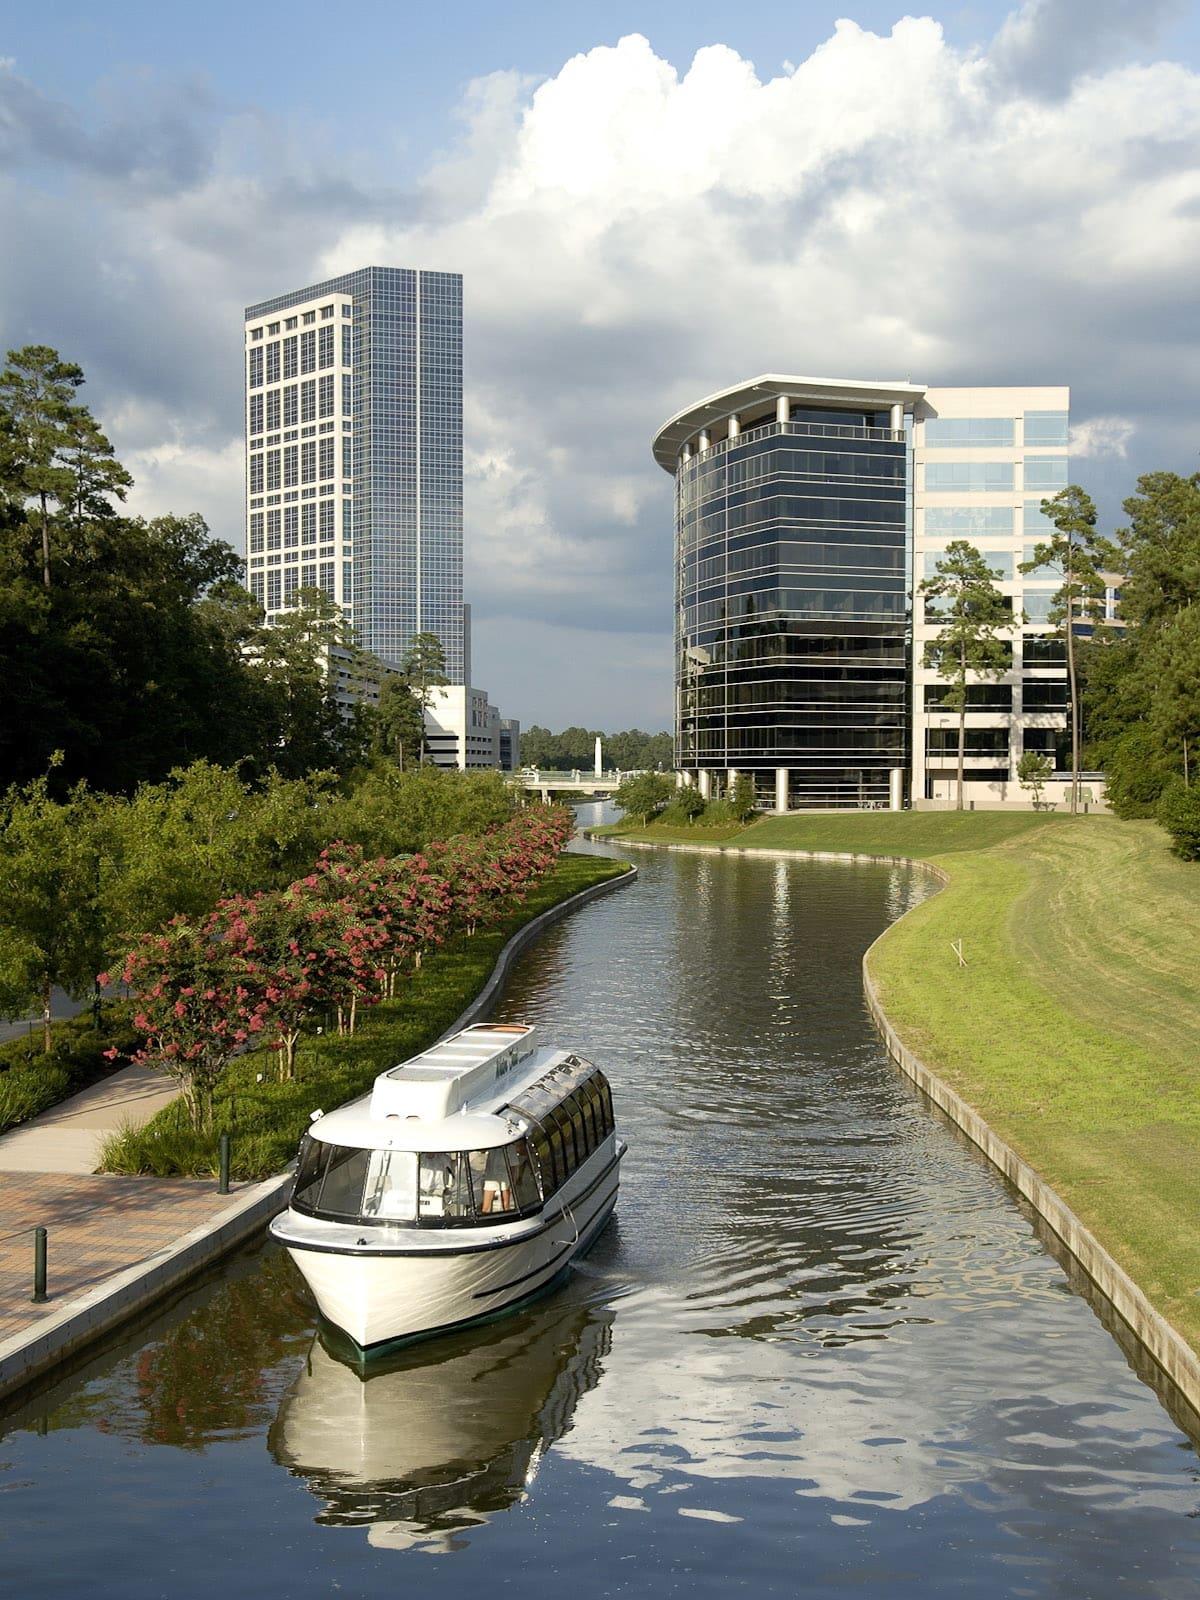 News_Ralph Bivins_master-planned communities_The Woodlands_waterway